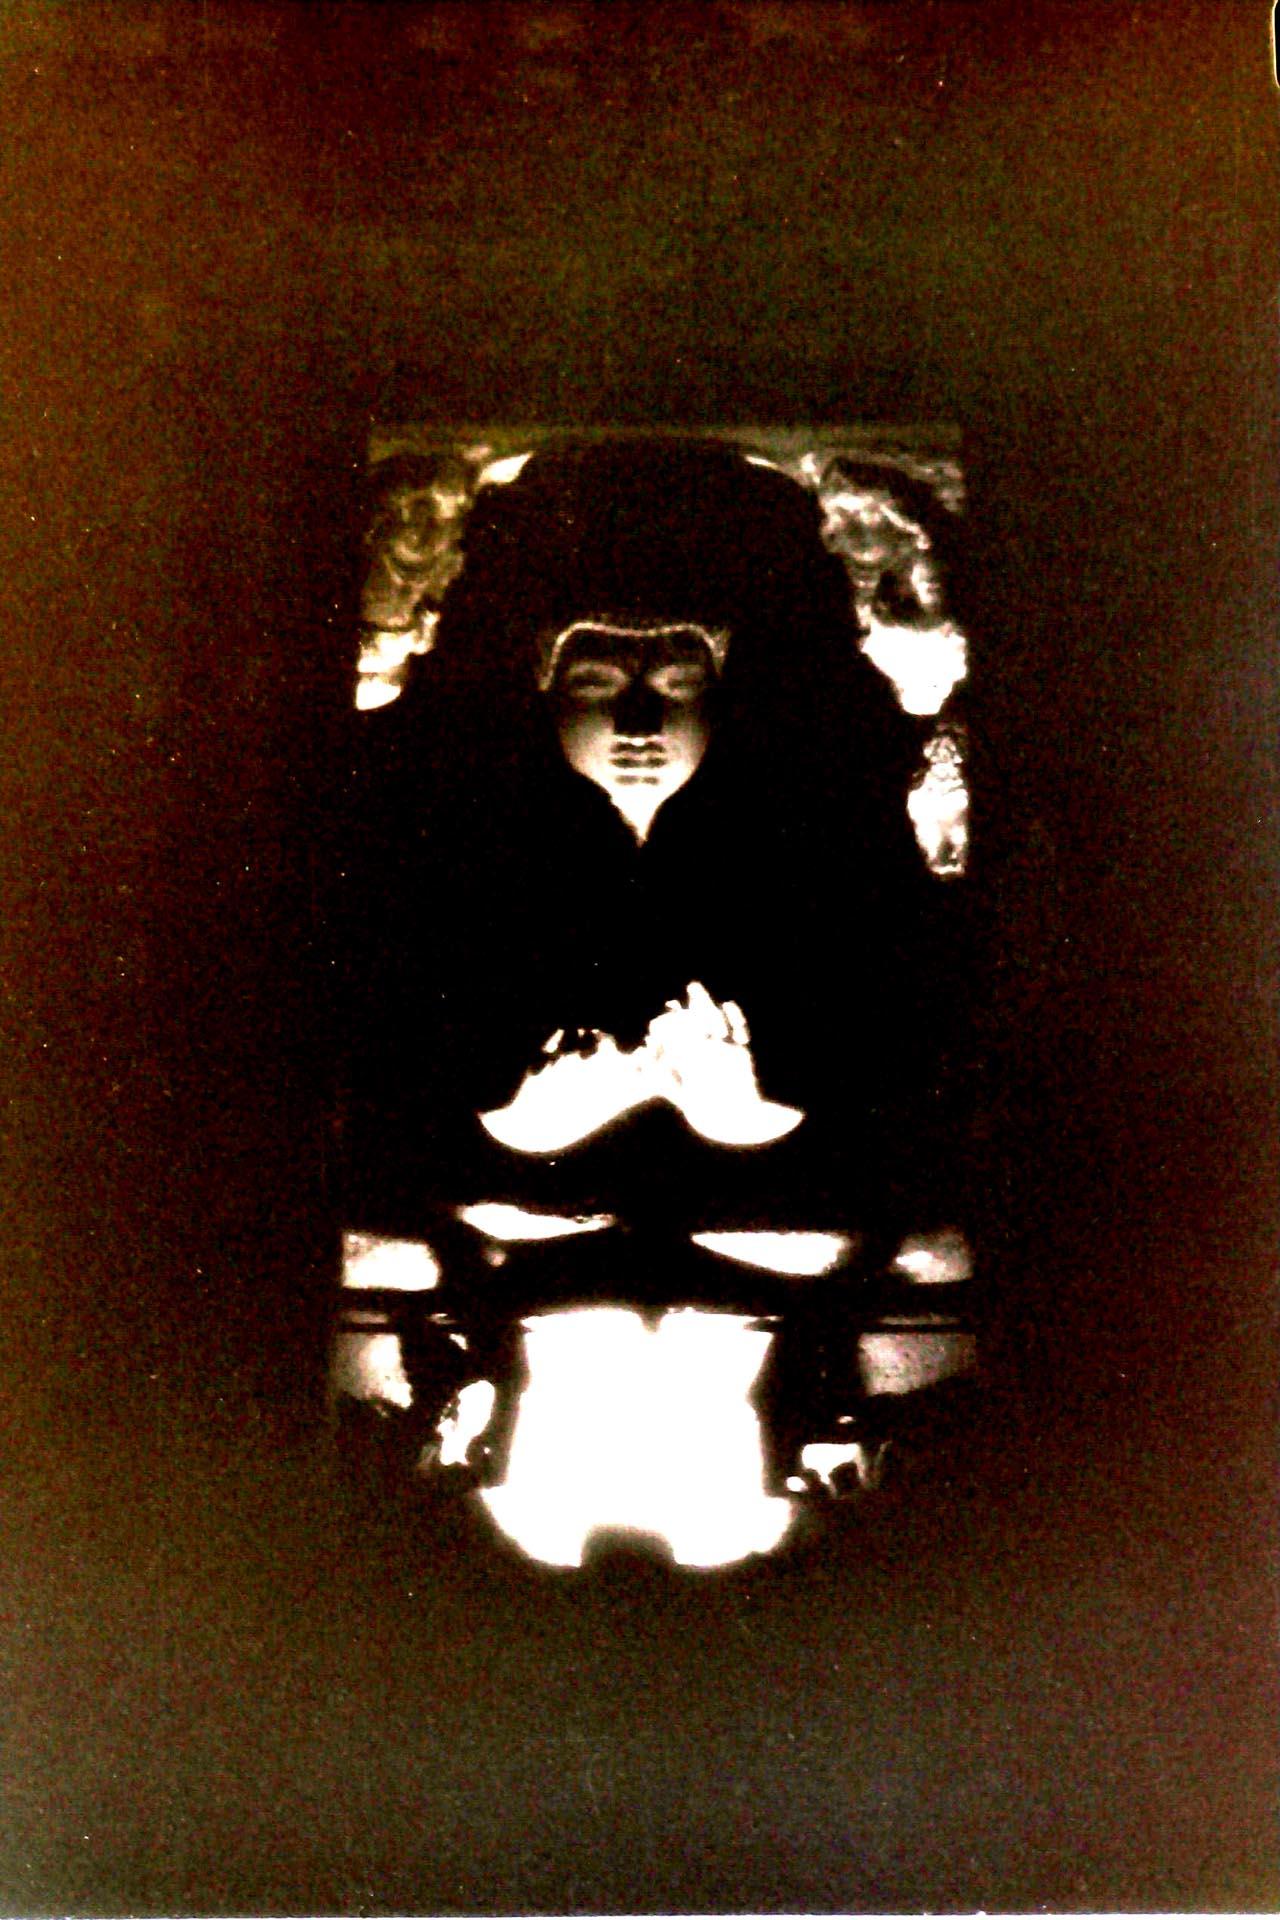 020-Tempio di Ajanta,India '90